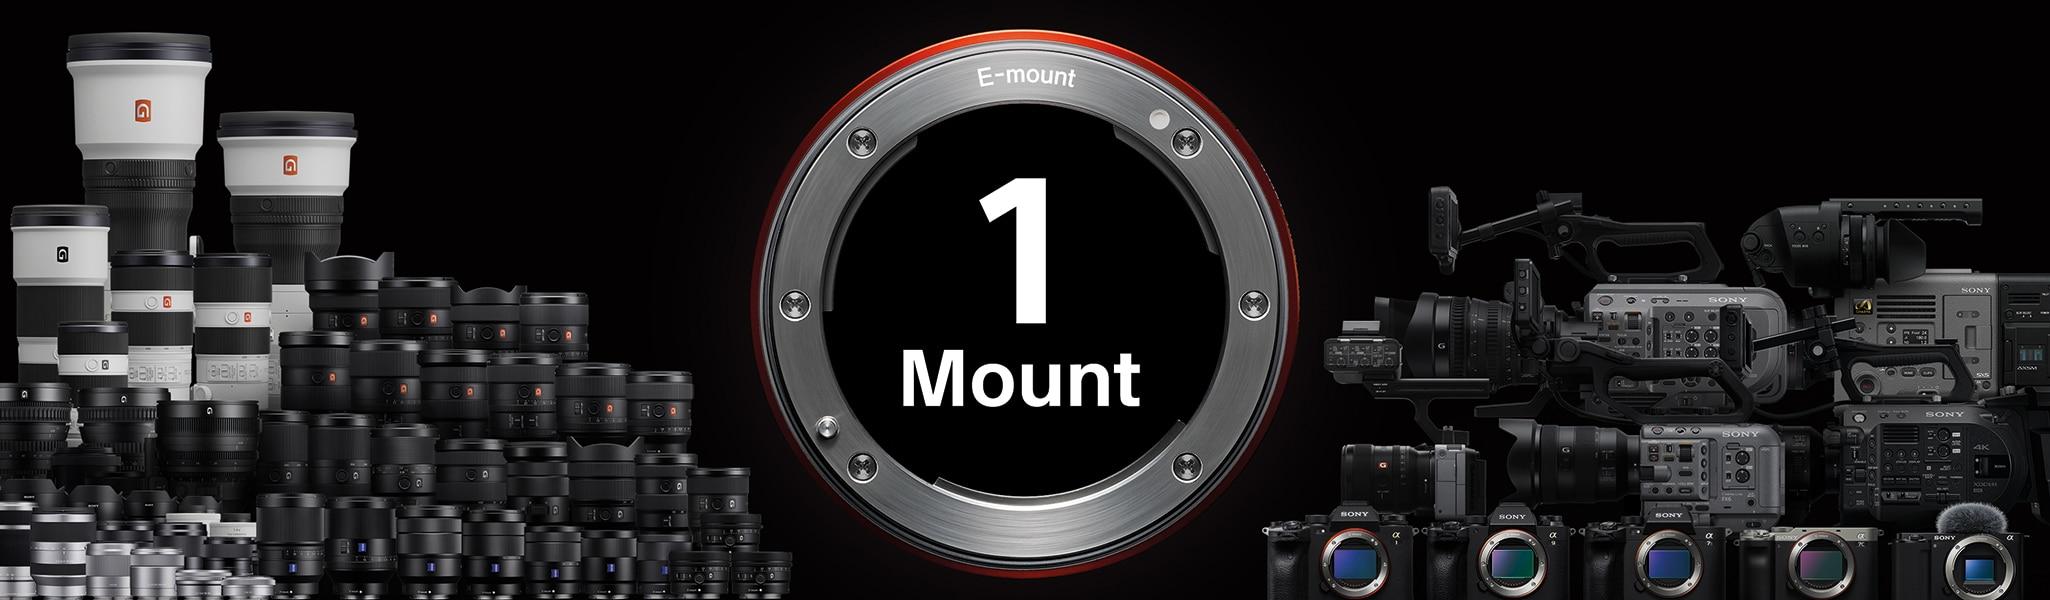 Sony 1 Mount Promotional Banner showing lens range